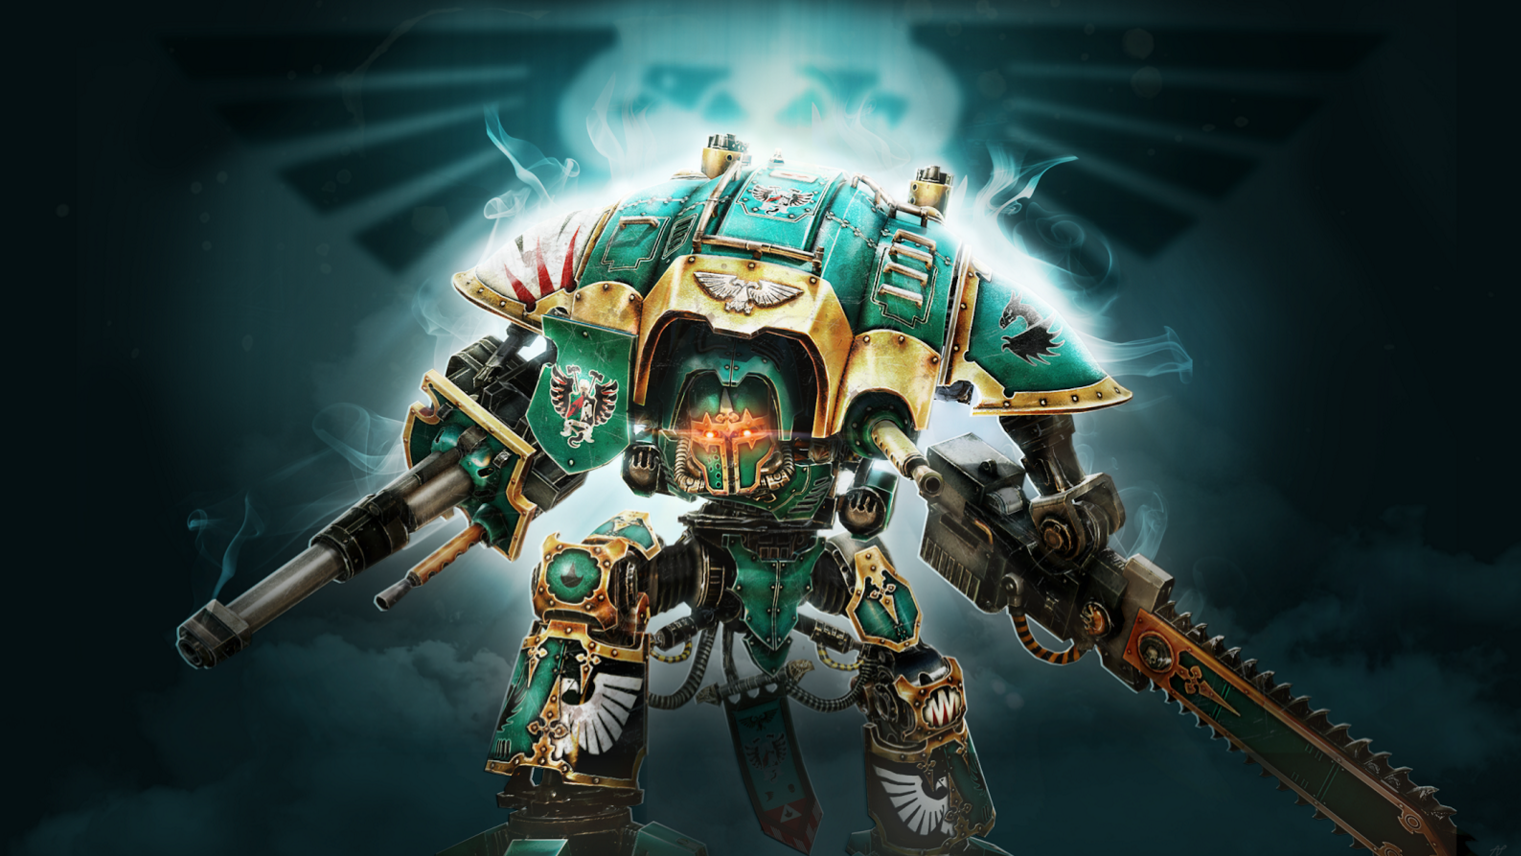 Warhammer_40k_40000_Freeblade_Play_Store_6